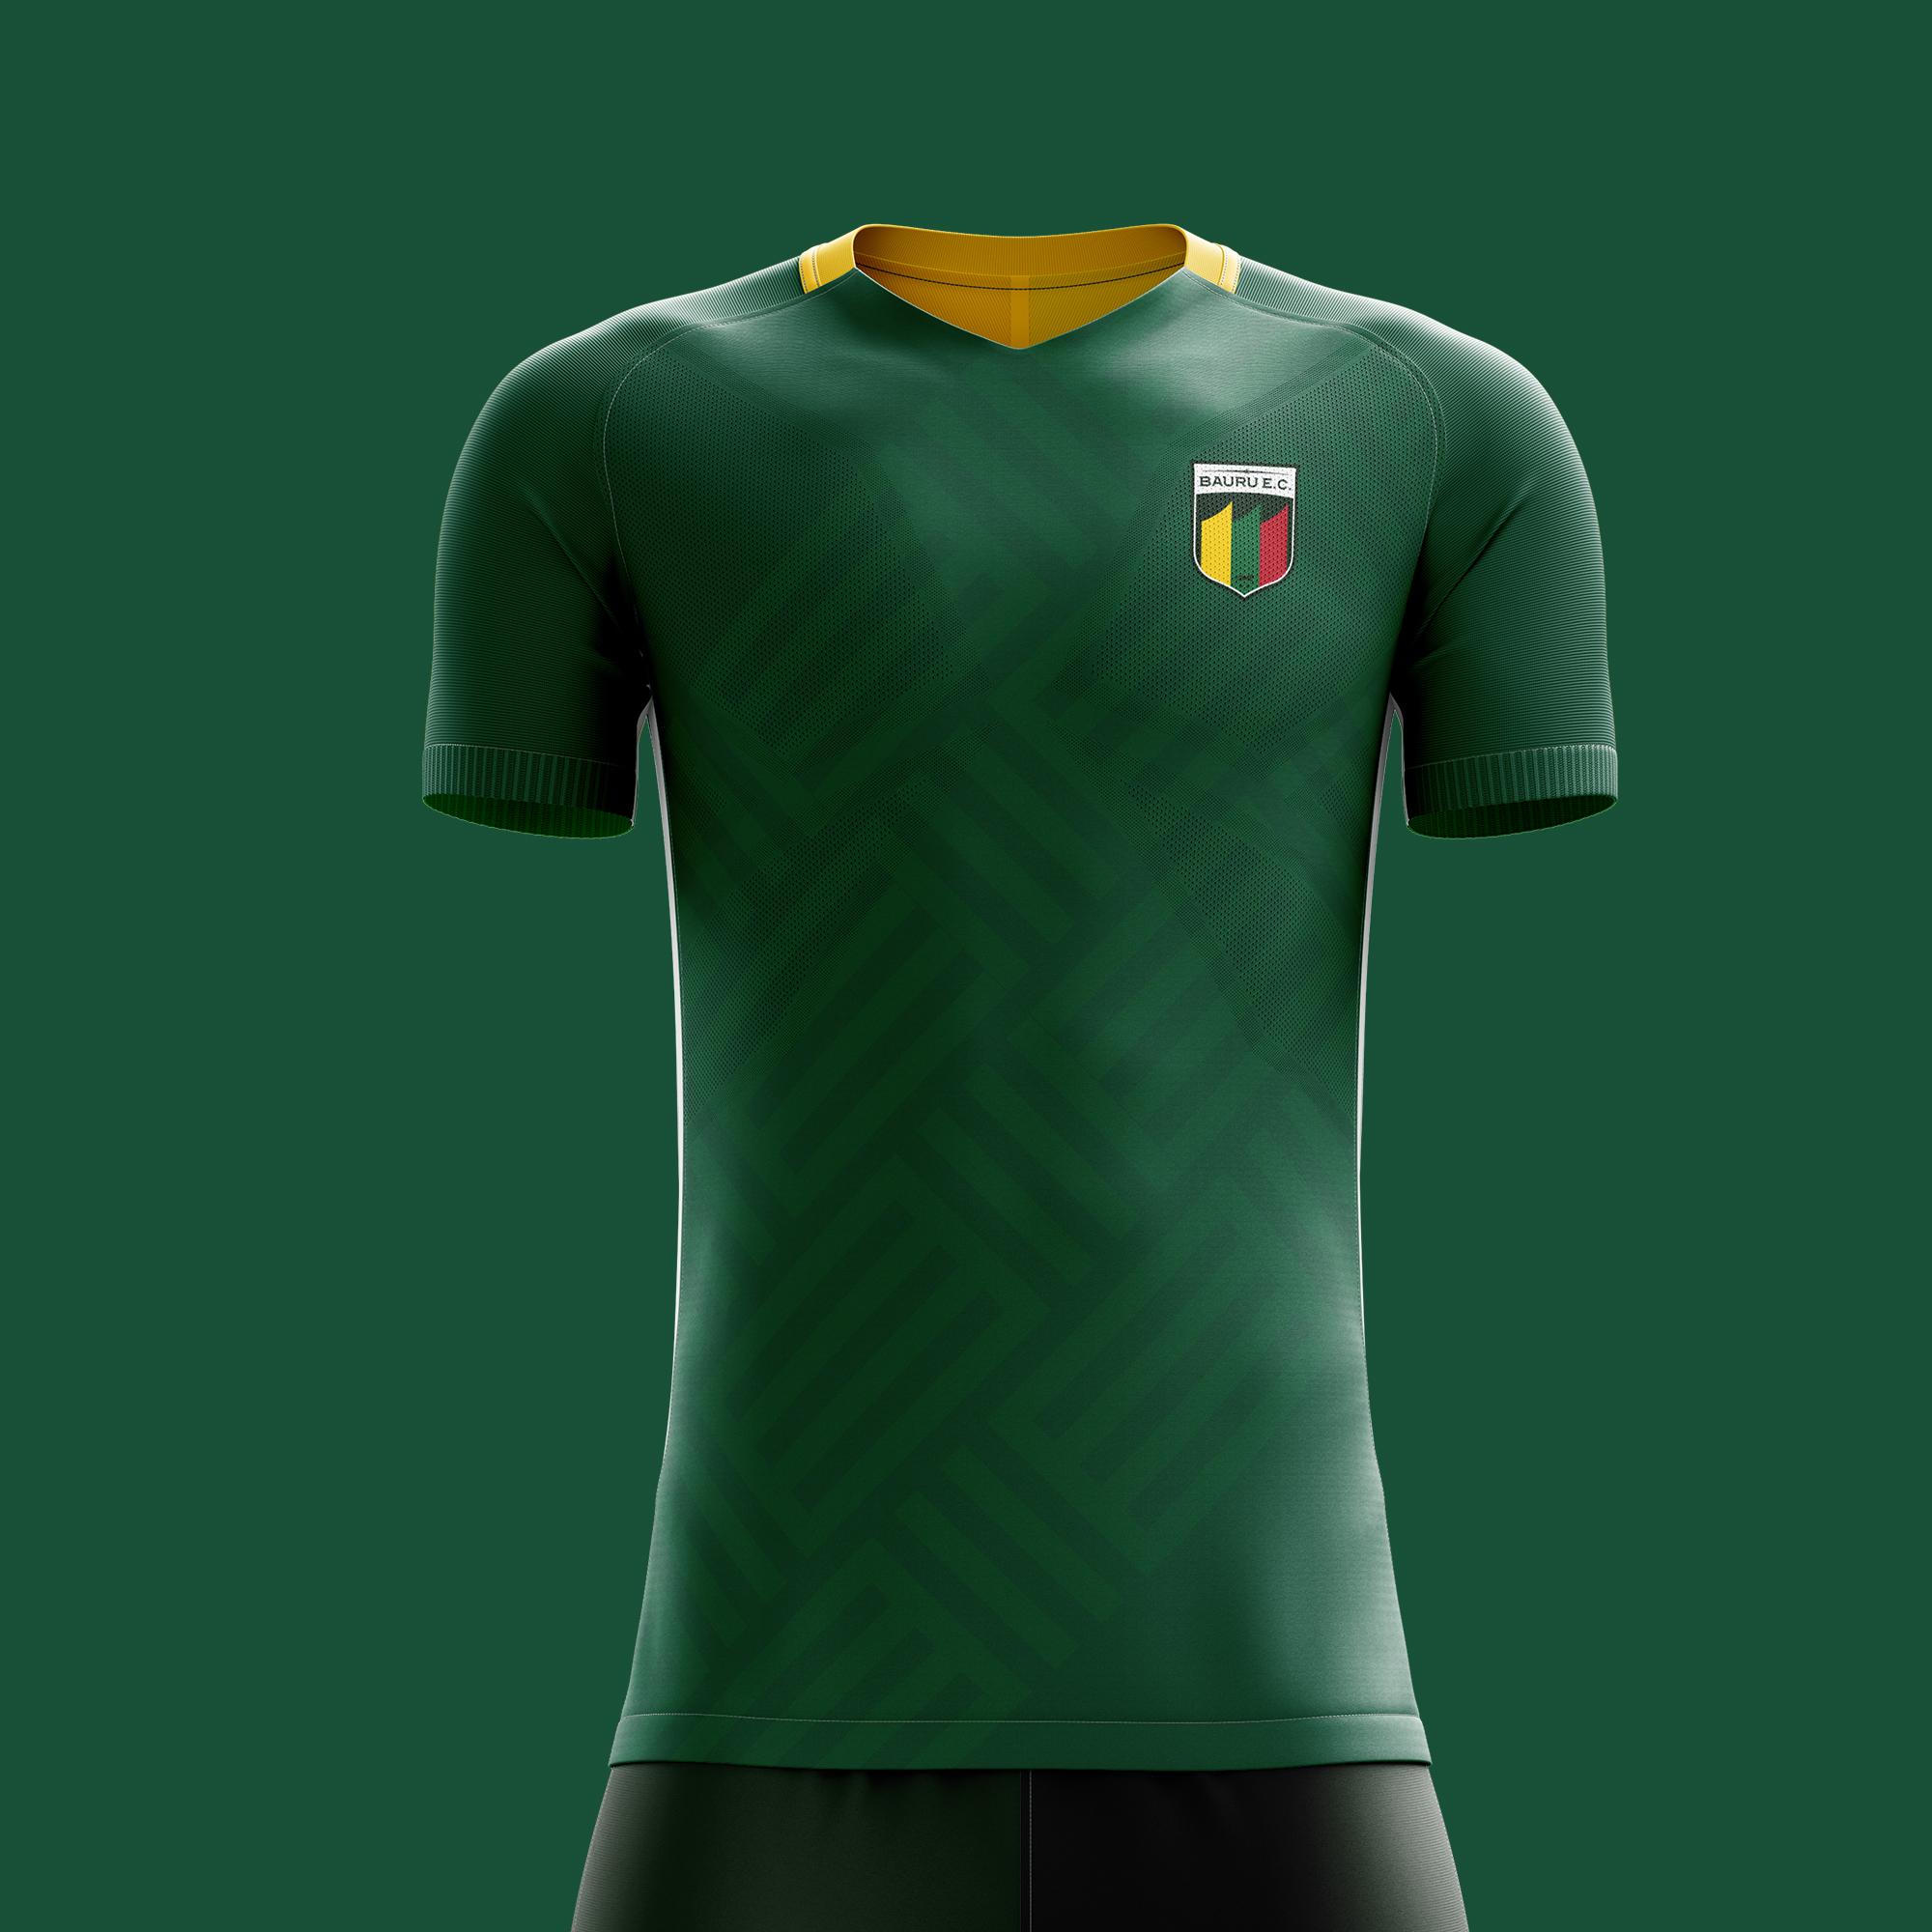 Branding Bauru Esporte Clube